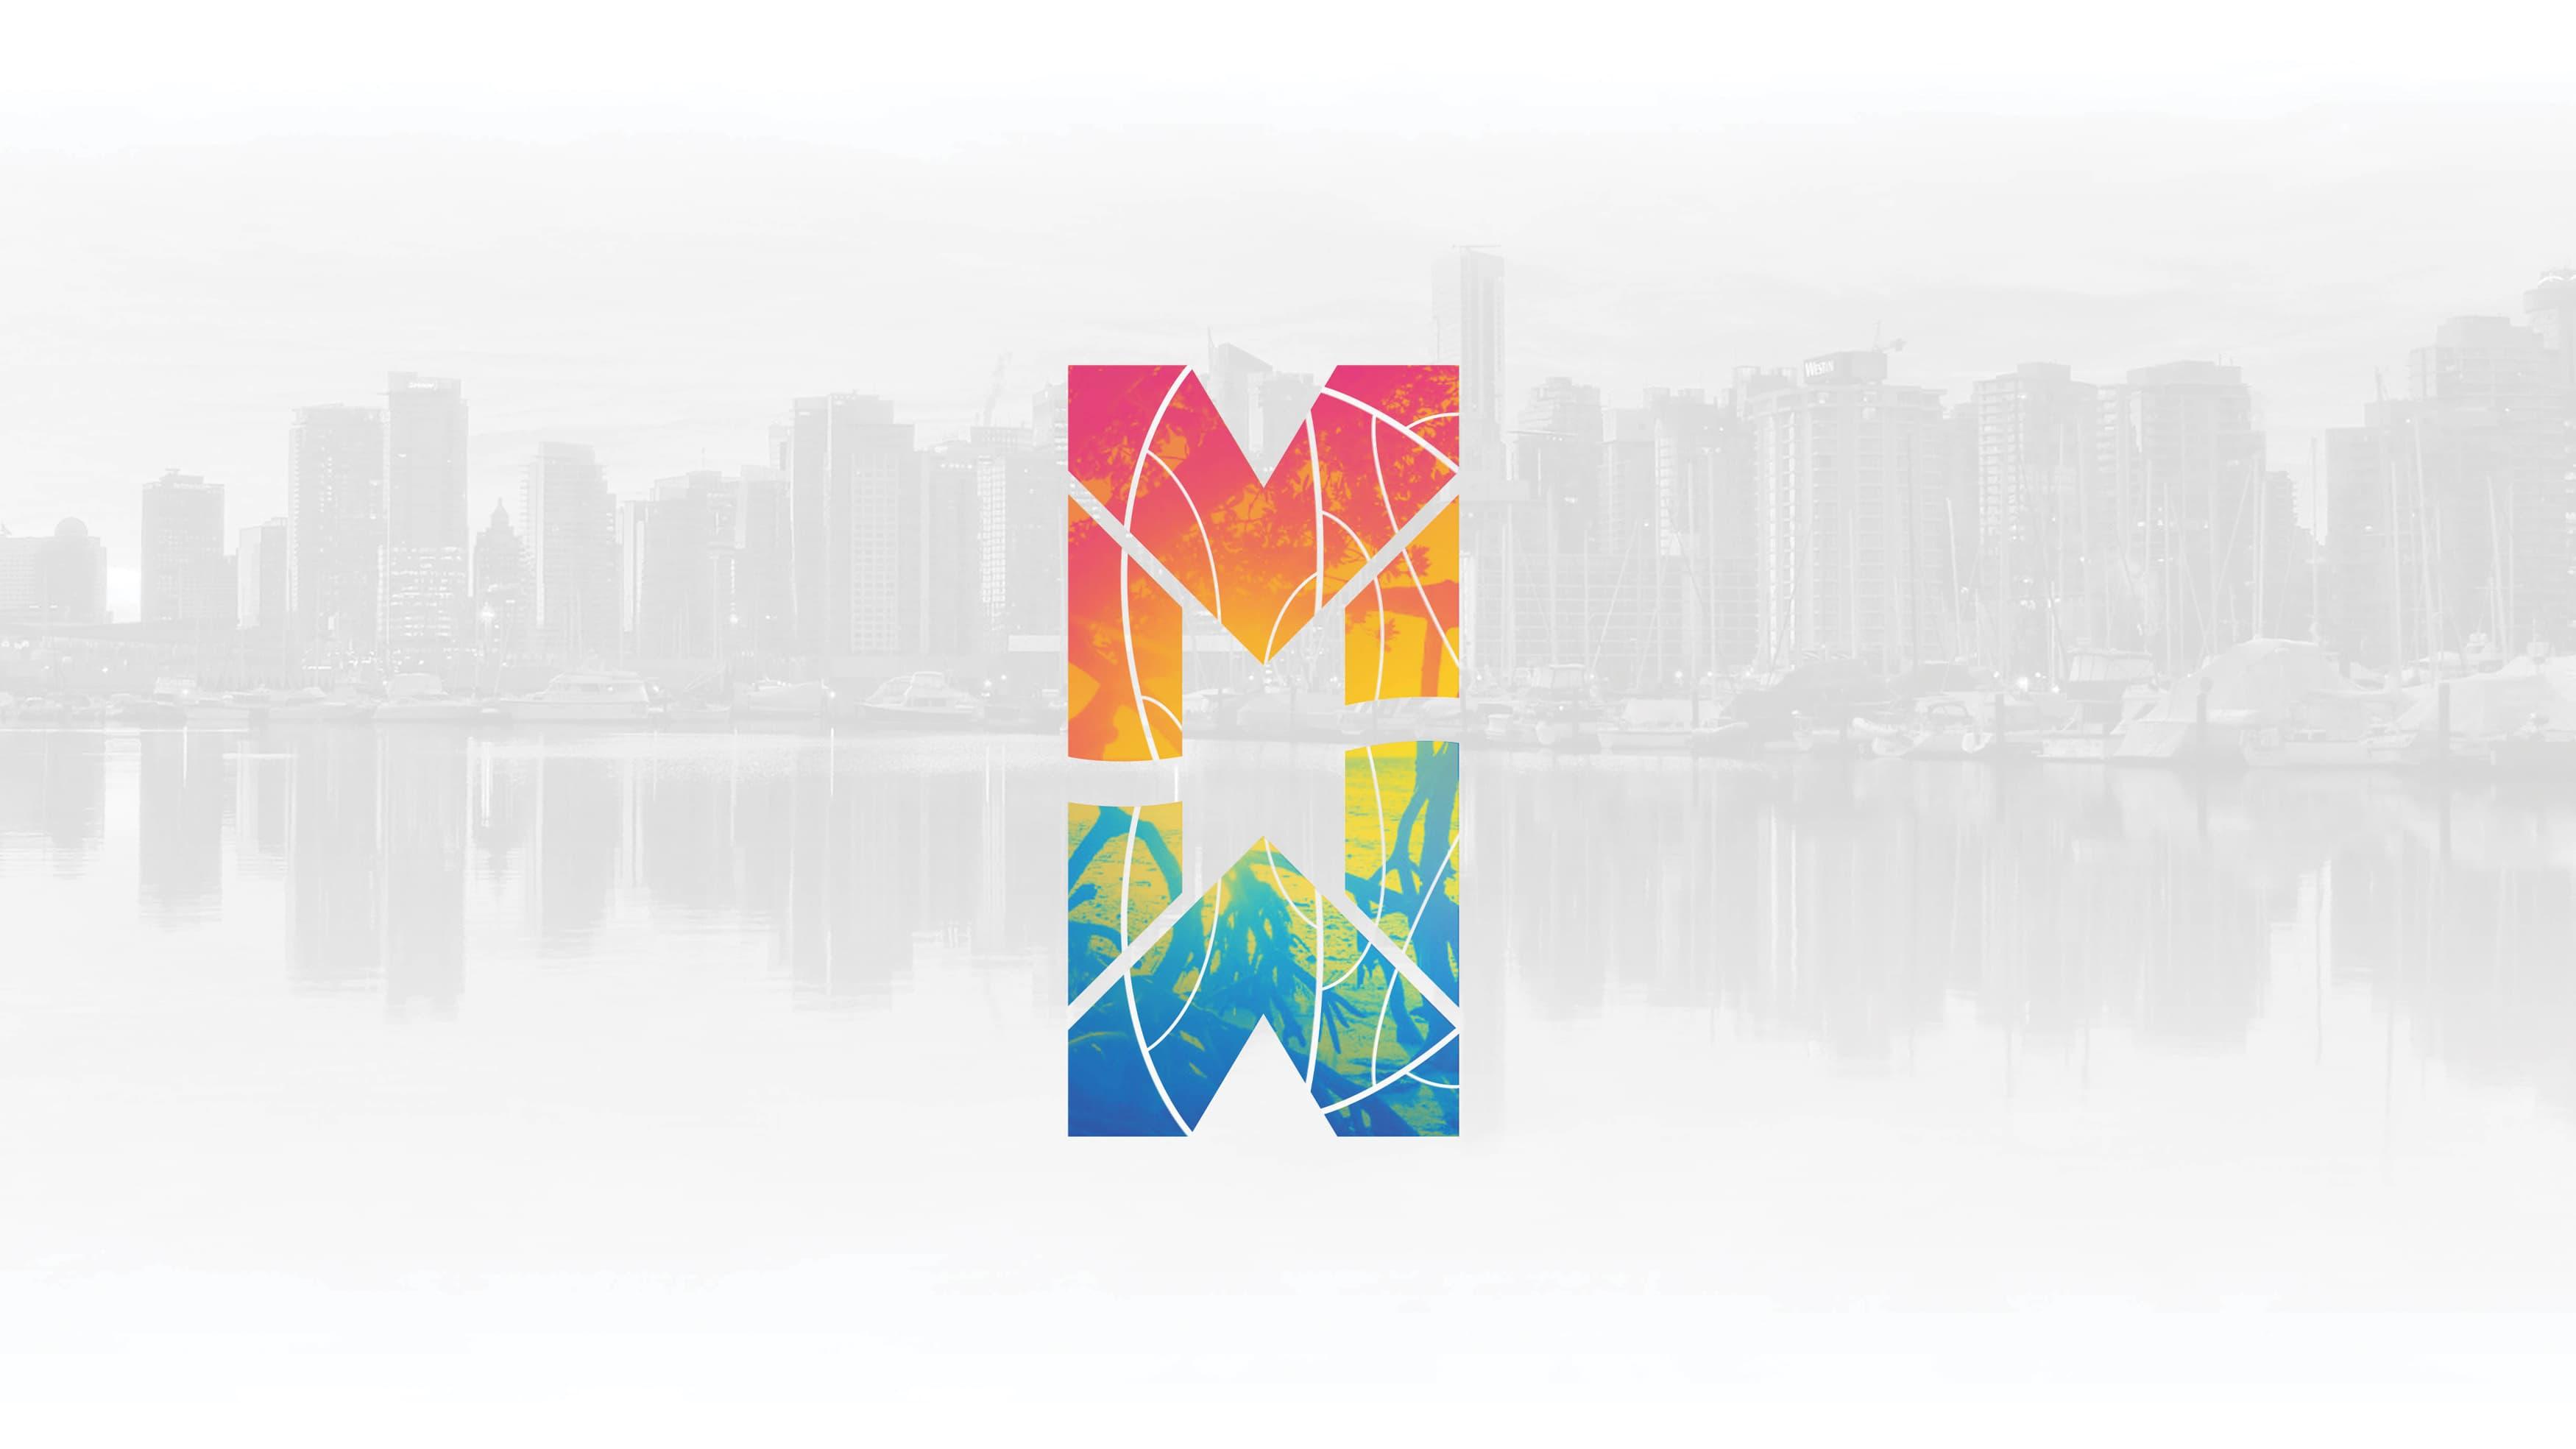 Miami Baywalk logo in multicolor on grey image background.